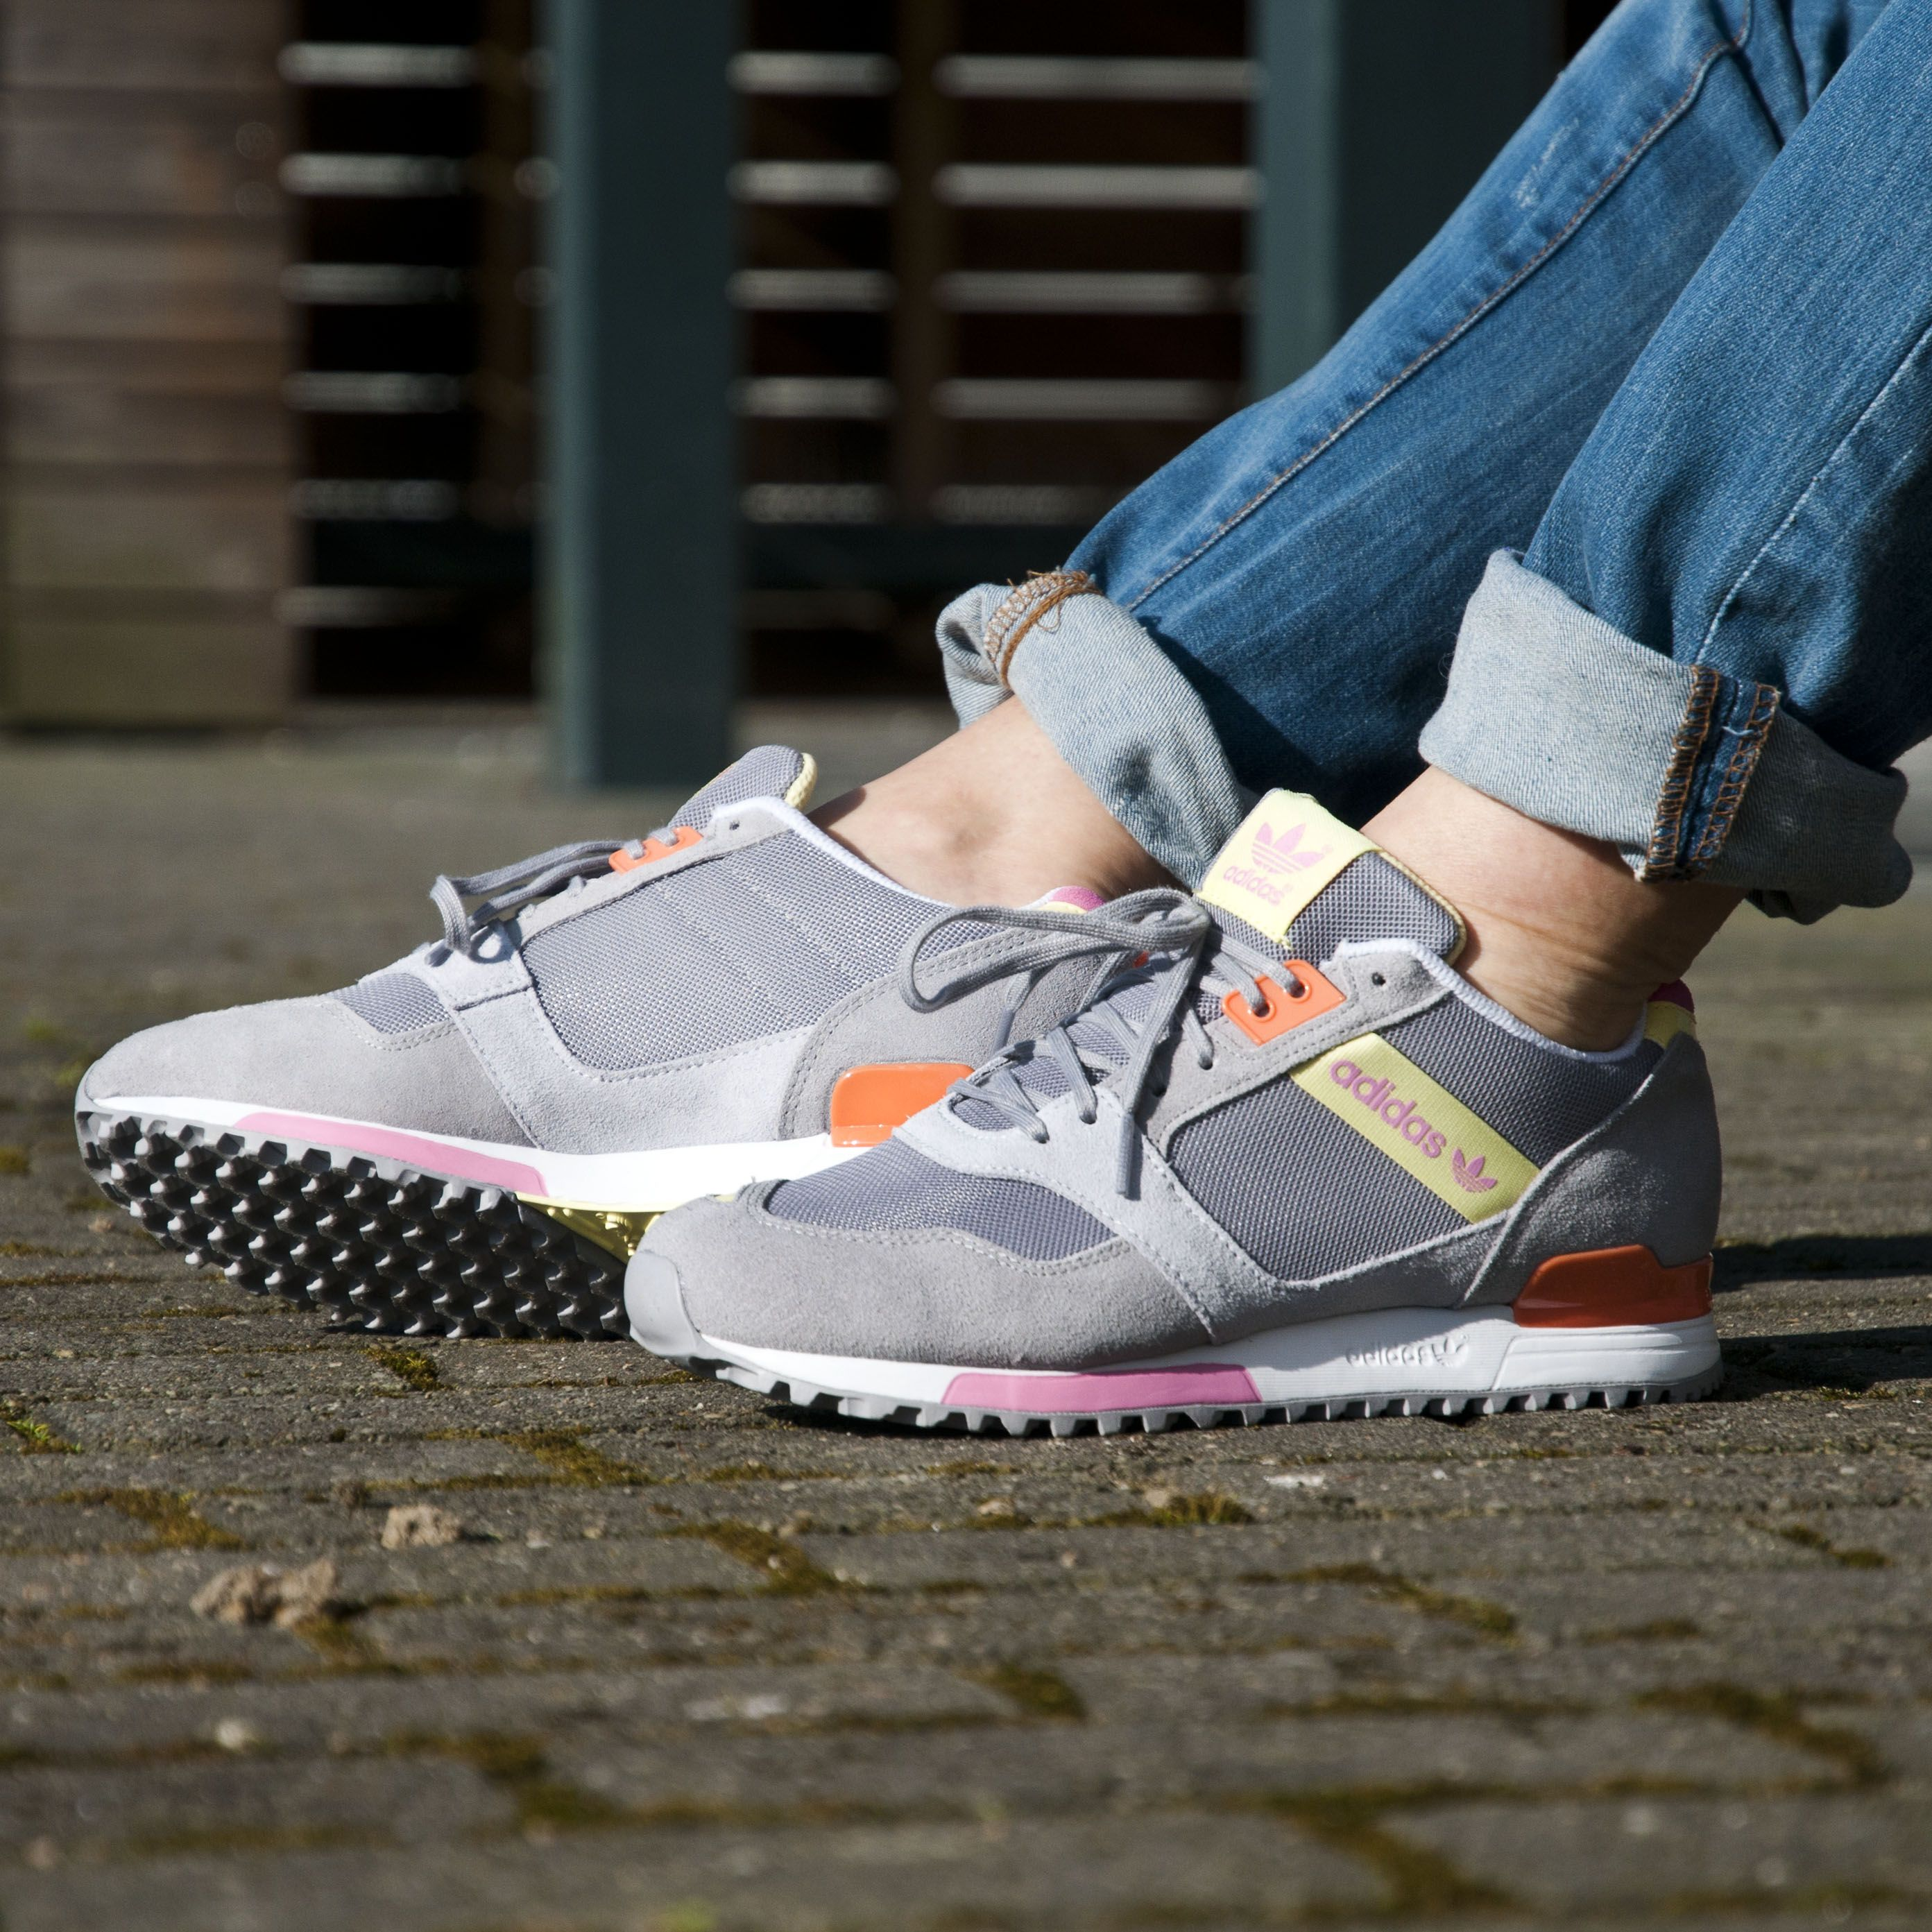 Adidas Zx 700 Flyknit Running Sneaker Shoes Perfect Shop Pink Green Womens